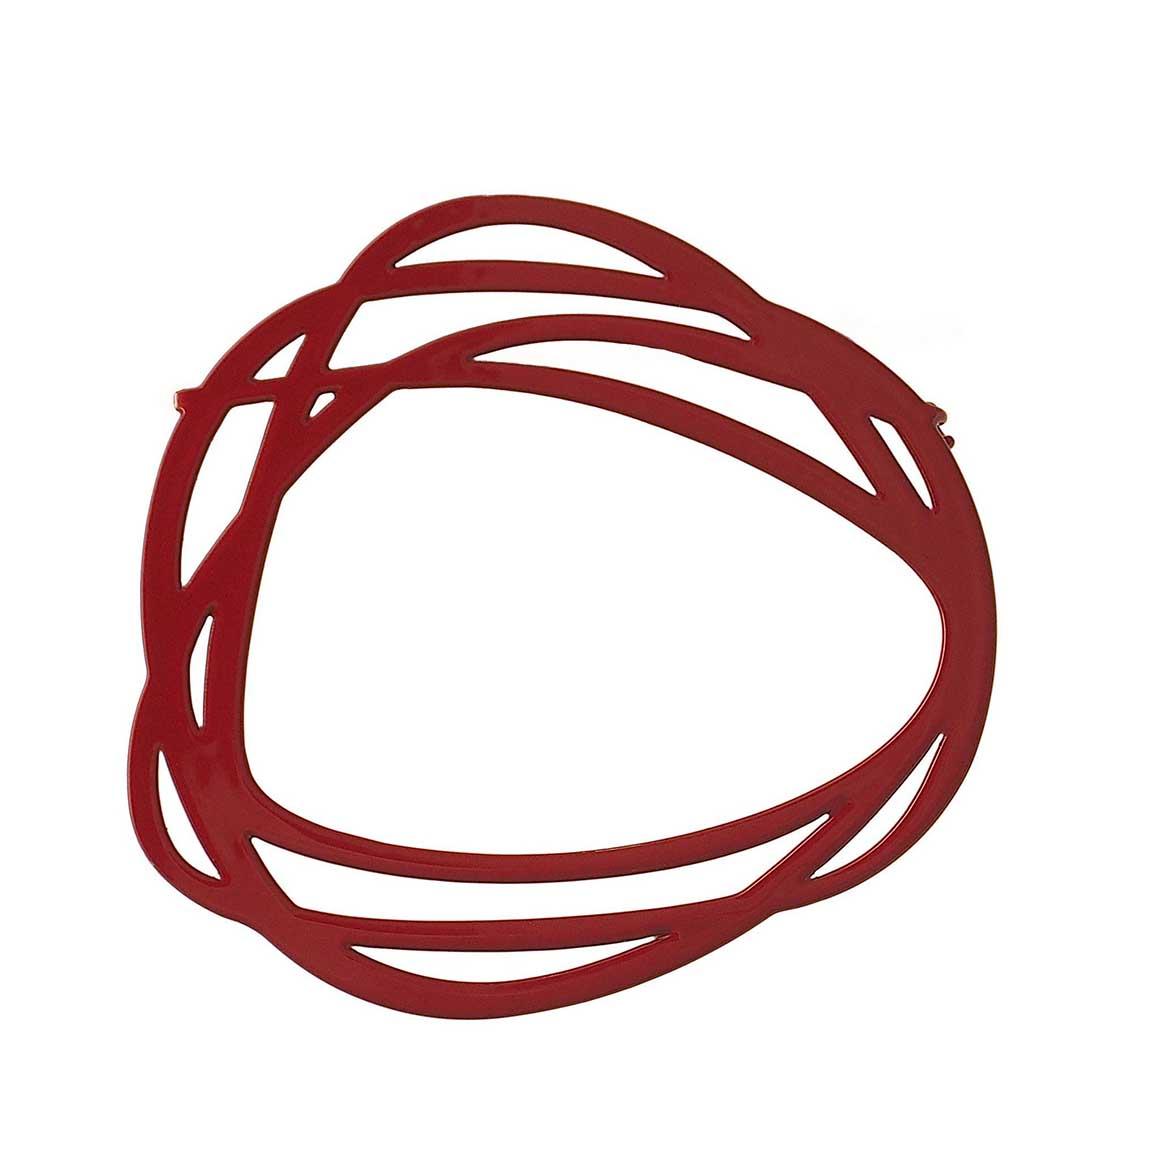 Brooch-Rings-Claret | Trada Marketplace